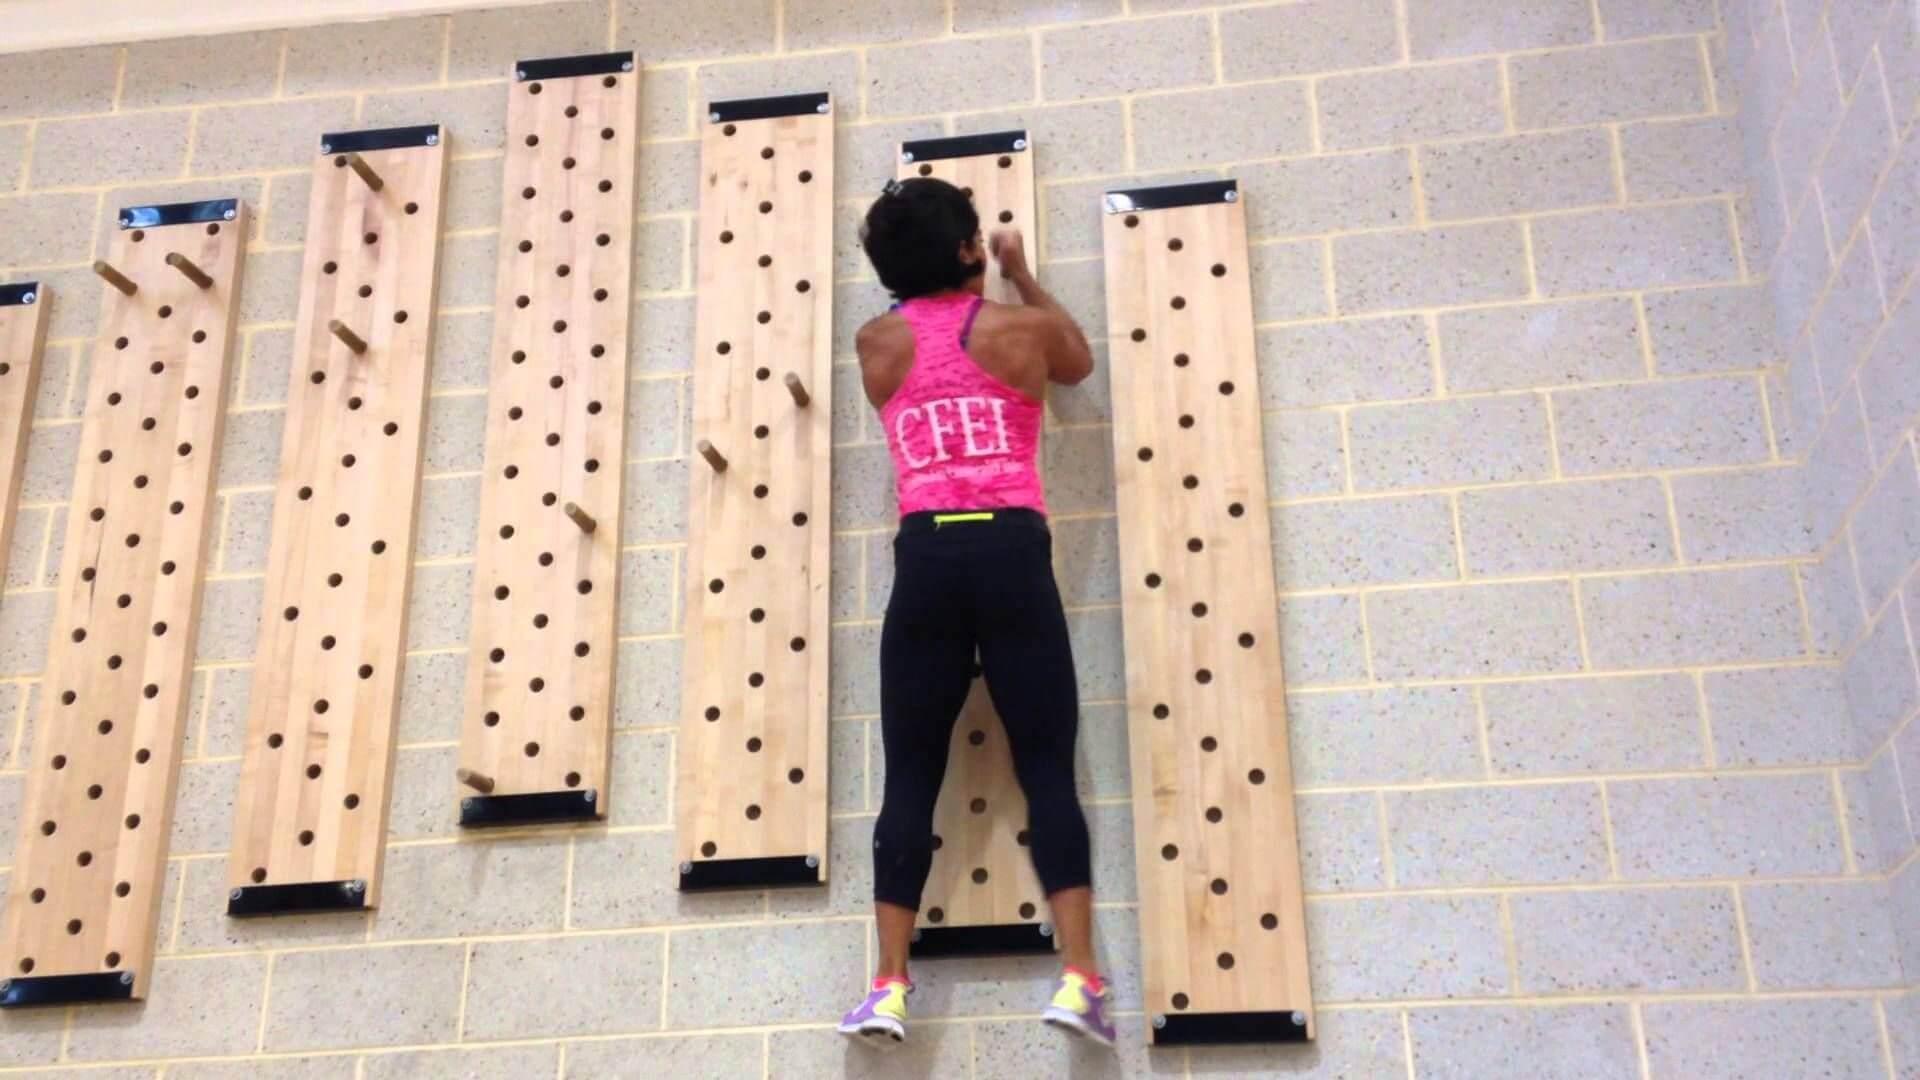 Mejores Pegboard para CrossFit